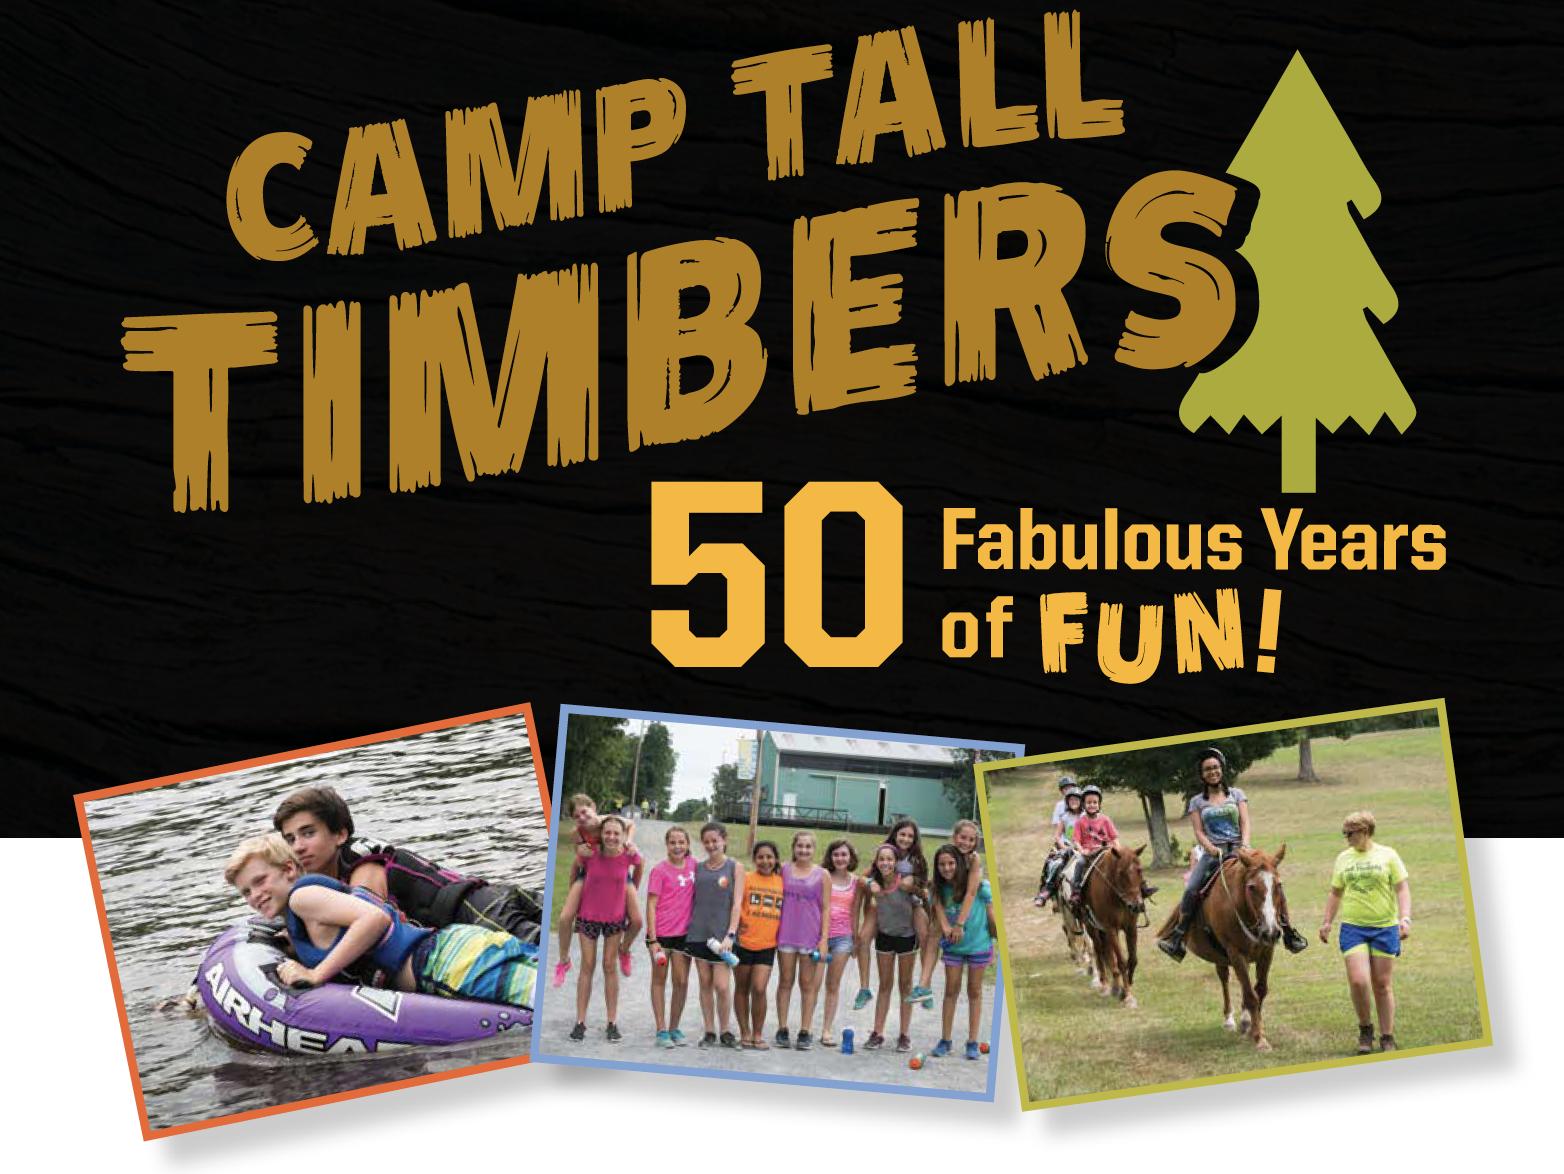 Celebrating 50 years of Camp Fun!